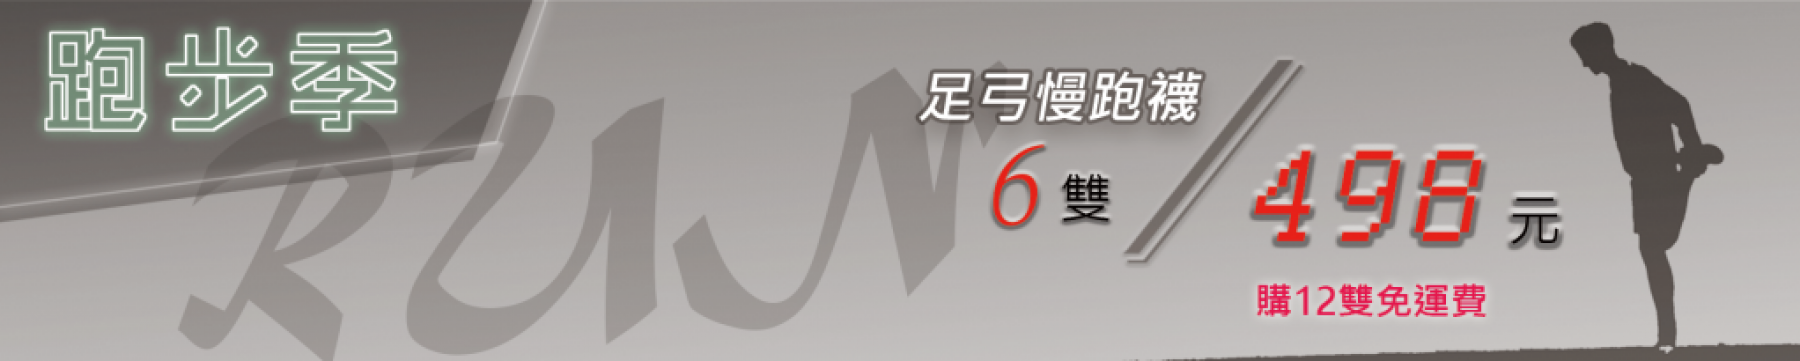 run 498 product banner